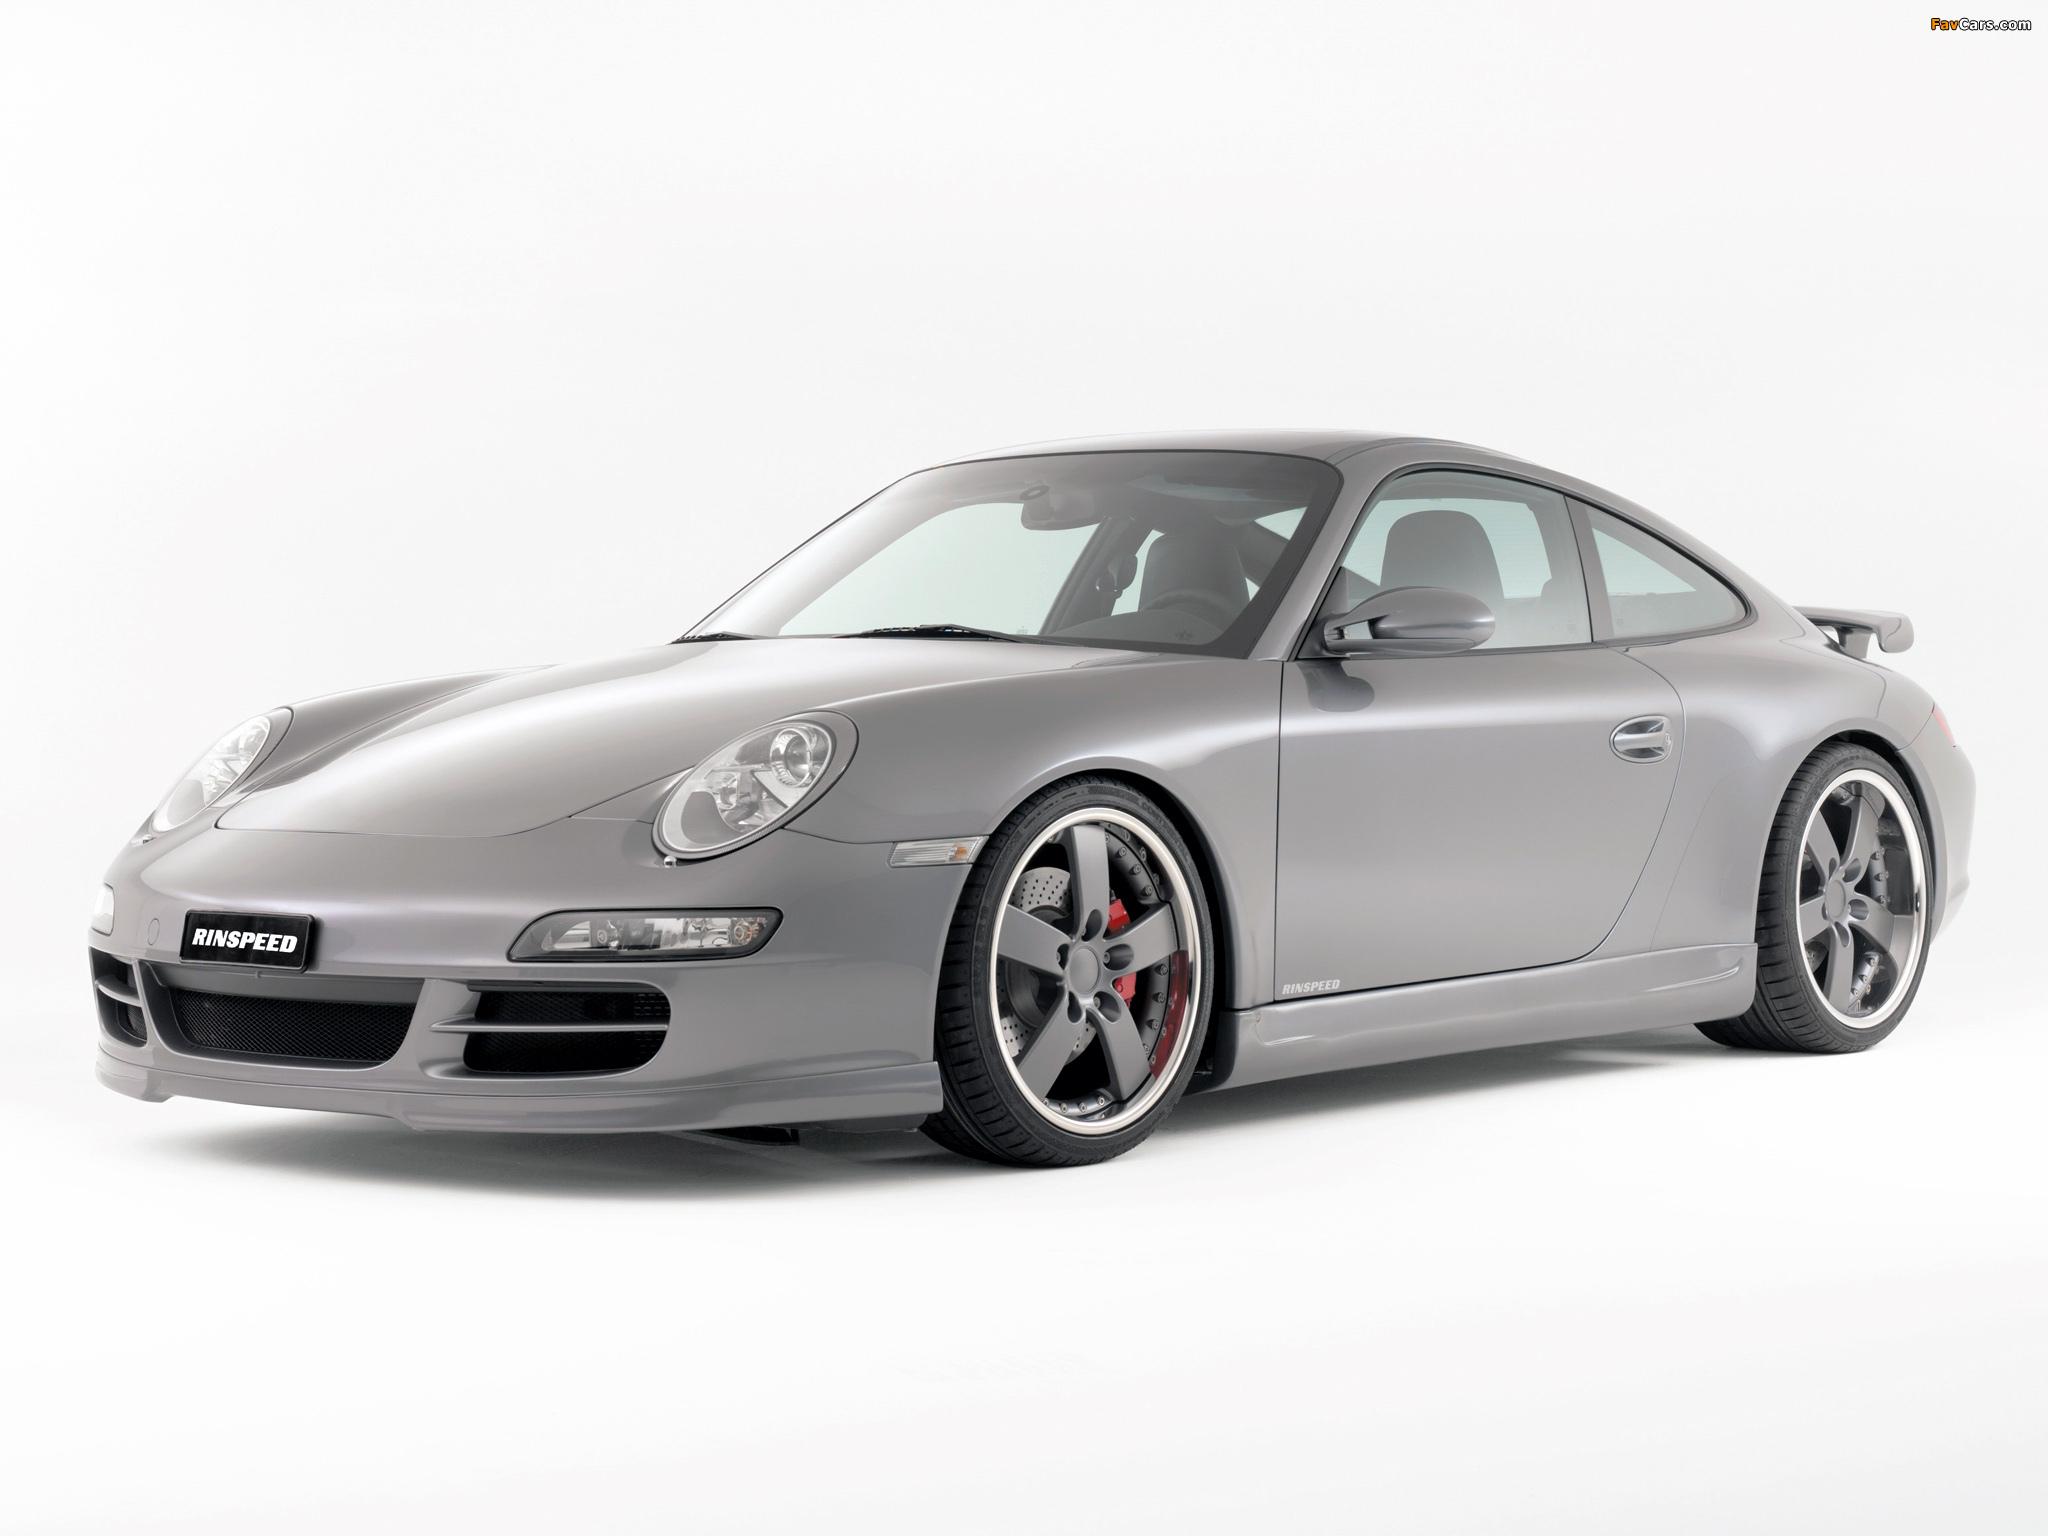 Rinspeed Porsche 911 Carrera Coupe (997) wallpapers (2048 x 1536)